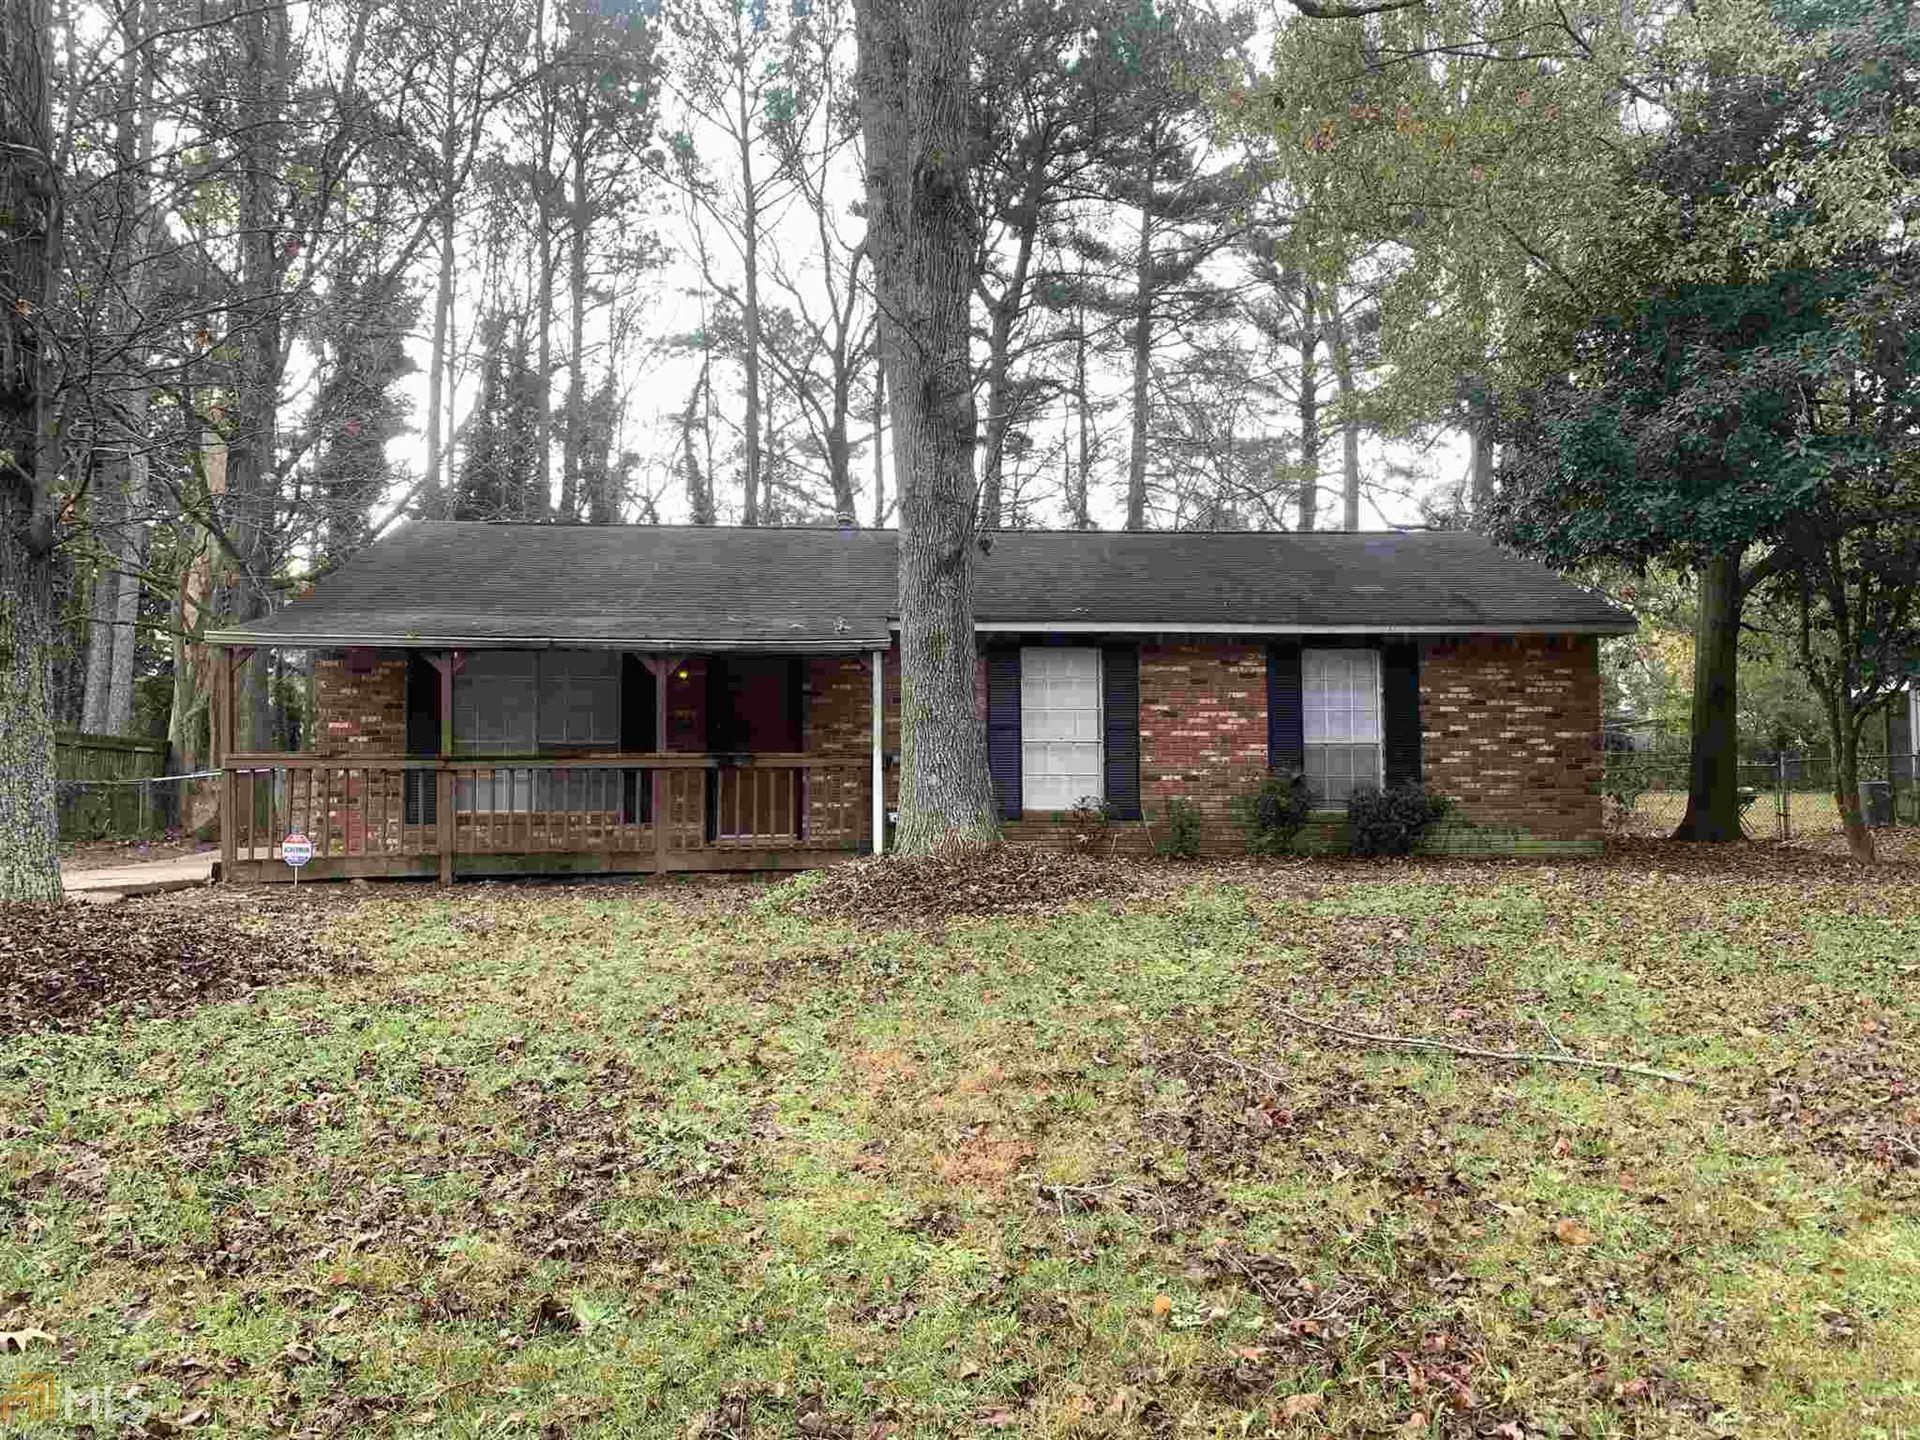 95 Sedgefield Dr, Jonesboro, GA 30236 - #: 8889797